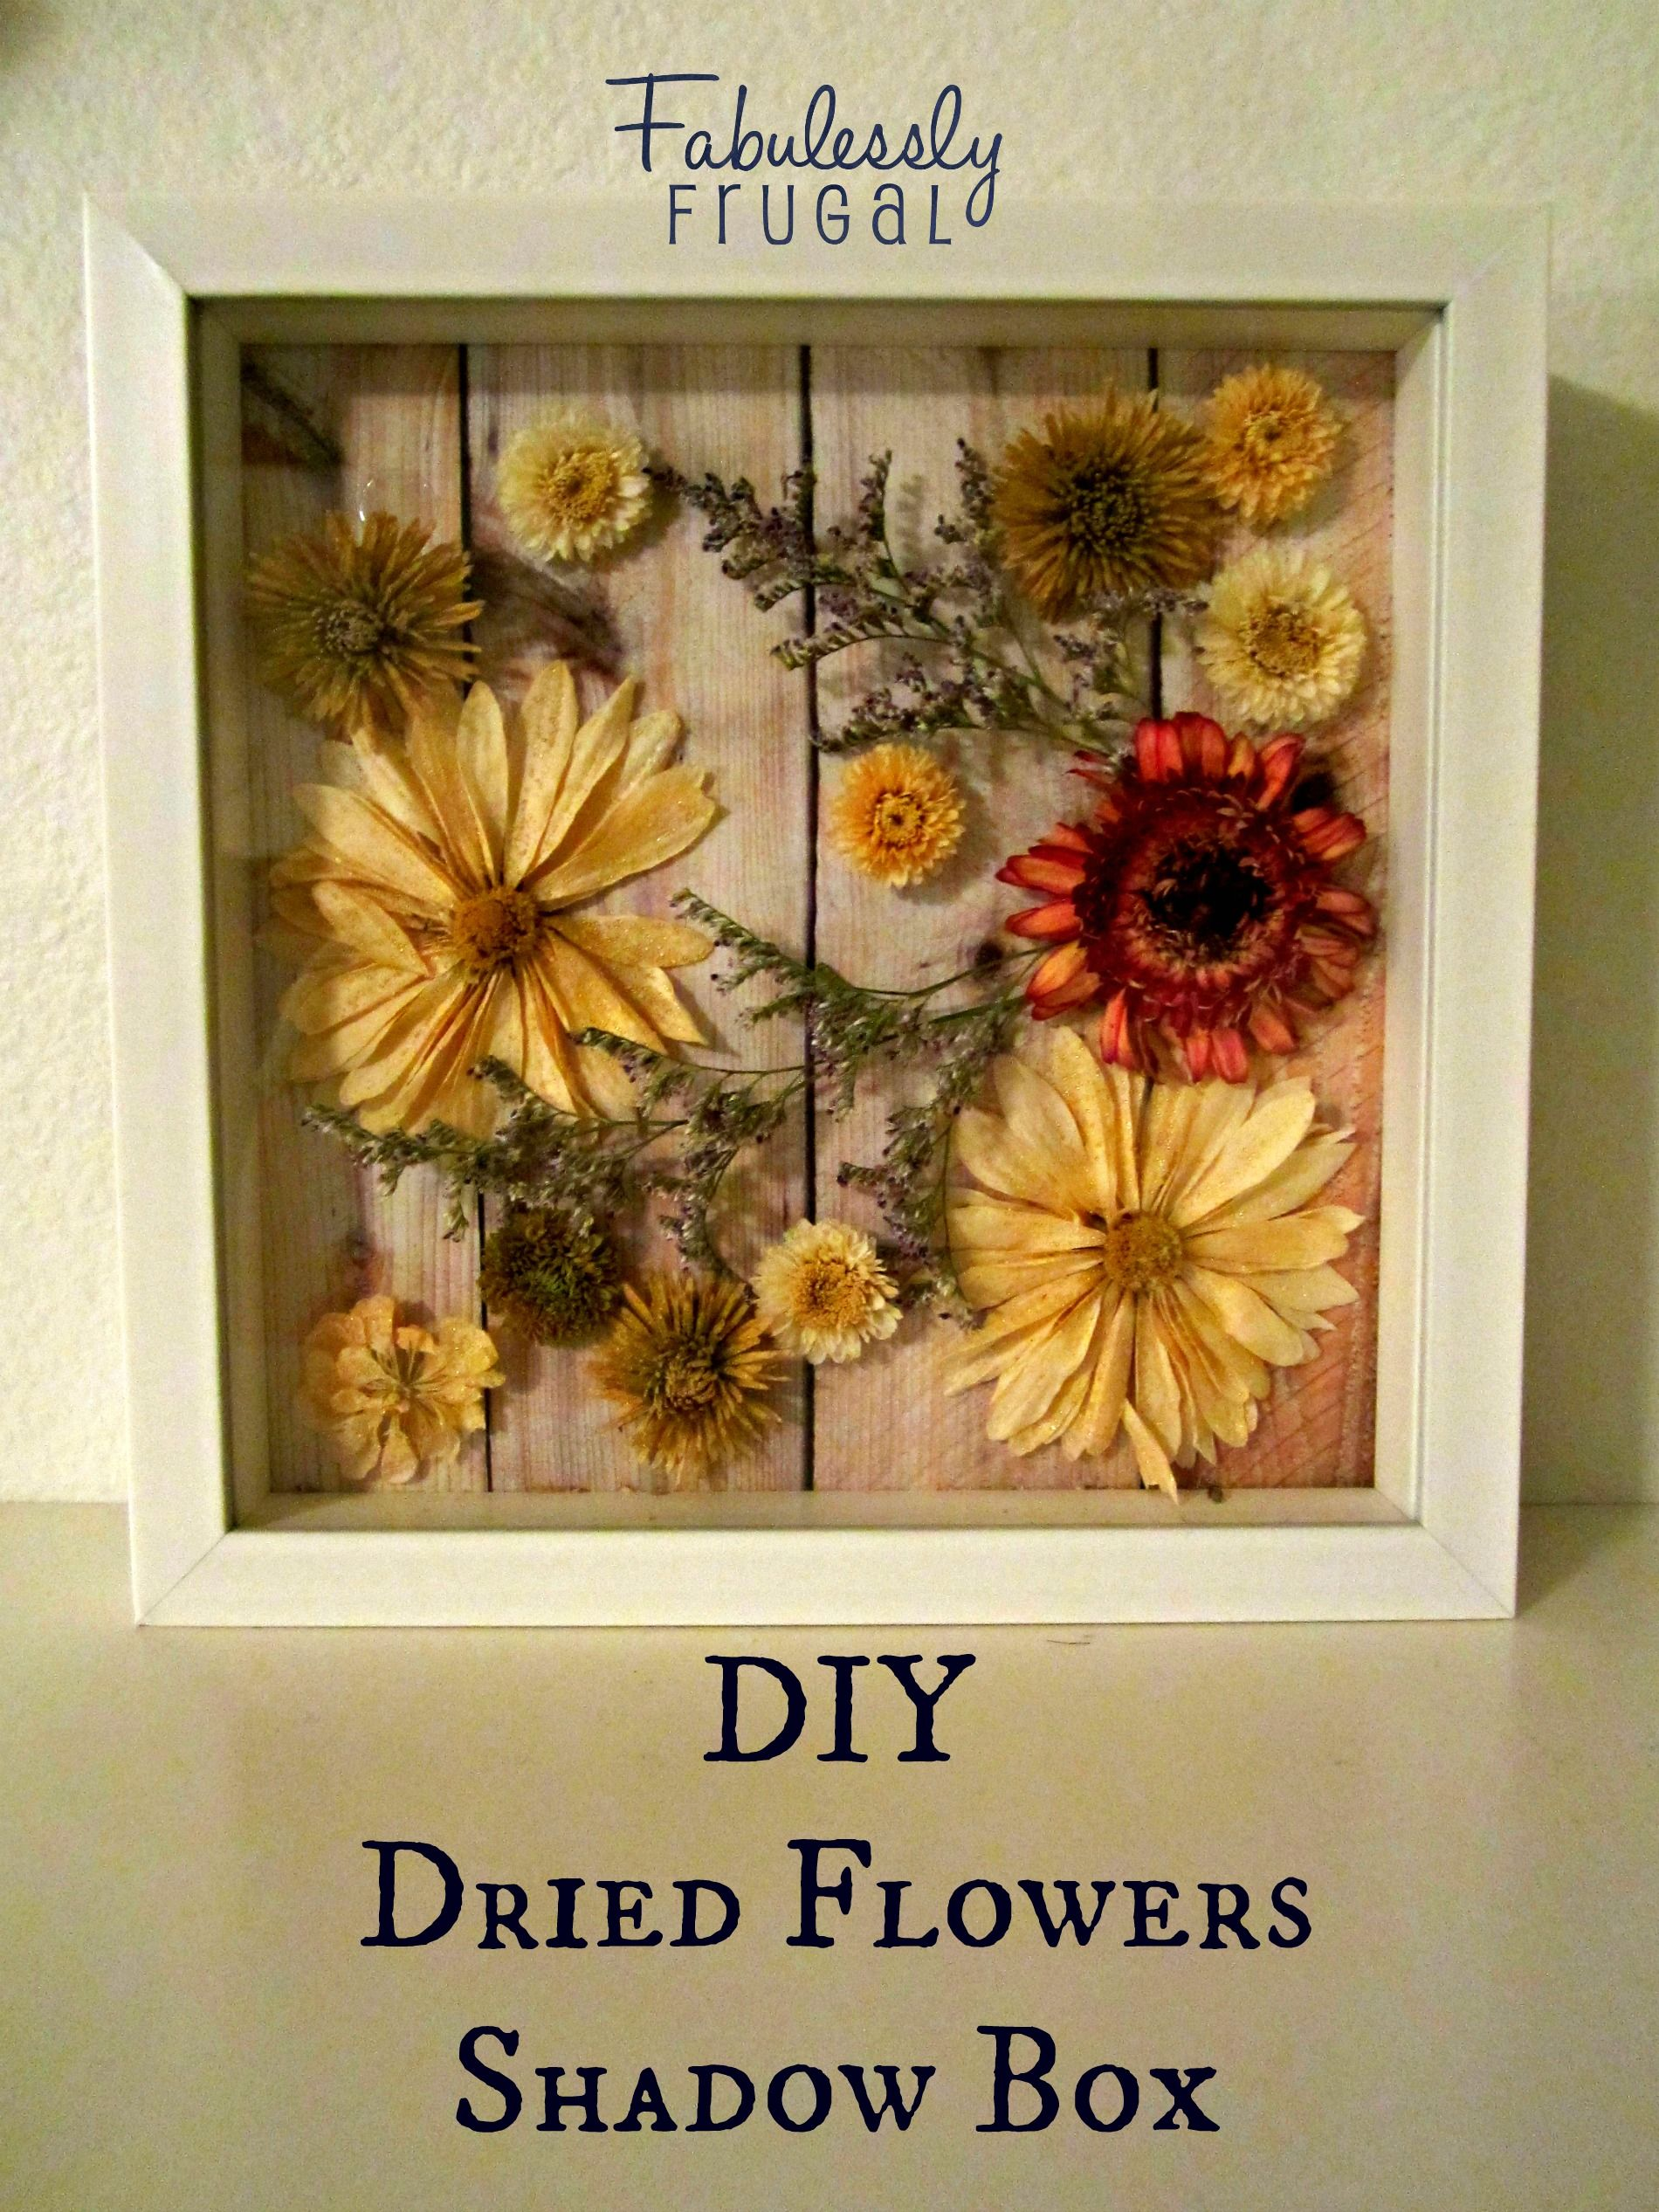 How to scrapbook dried flowers - Diy Dried Flowers Shadow Box